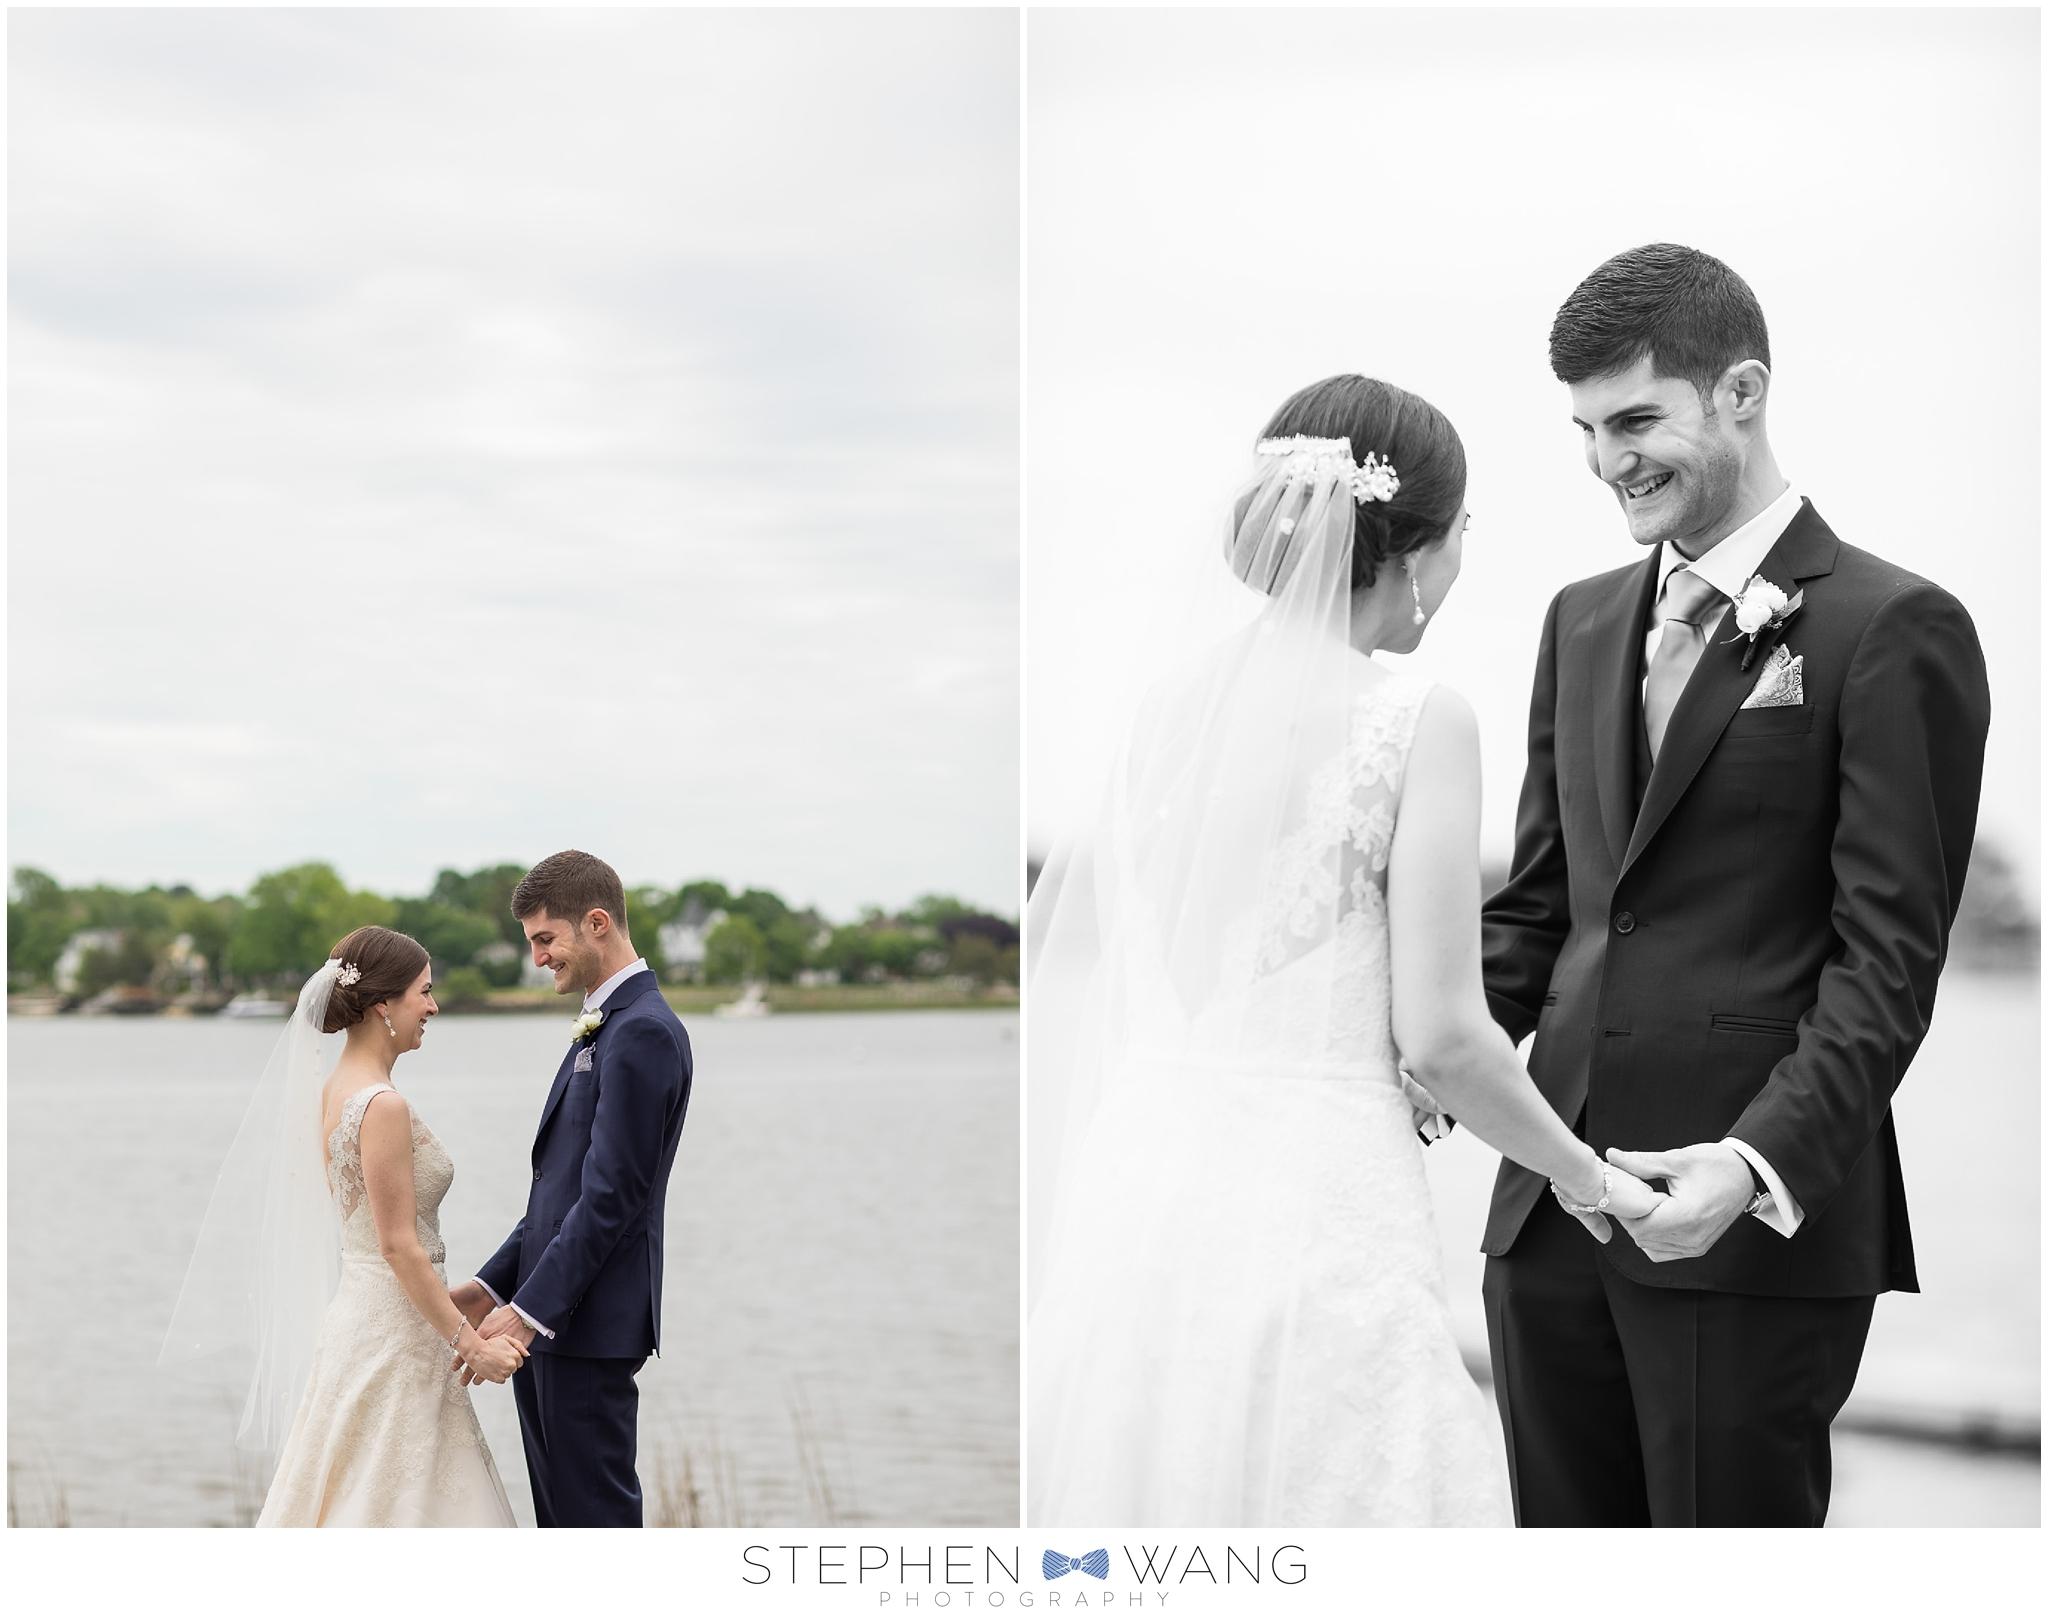 Stephen Wang Photography Shorehaven Norwalk CT Wedding Photographer connecticut shoreline shore haven - 13.jpg